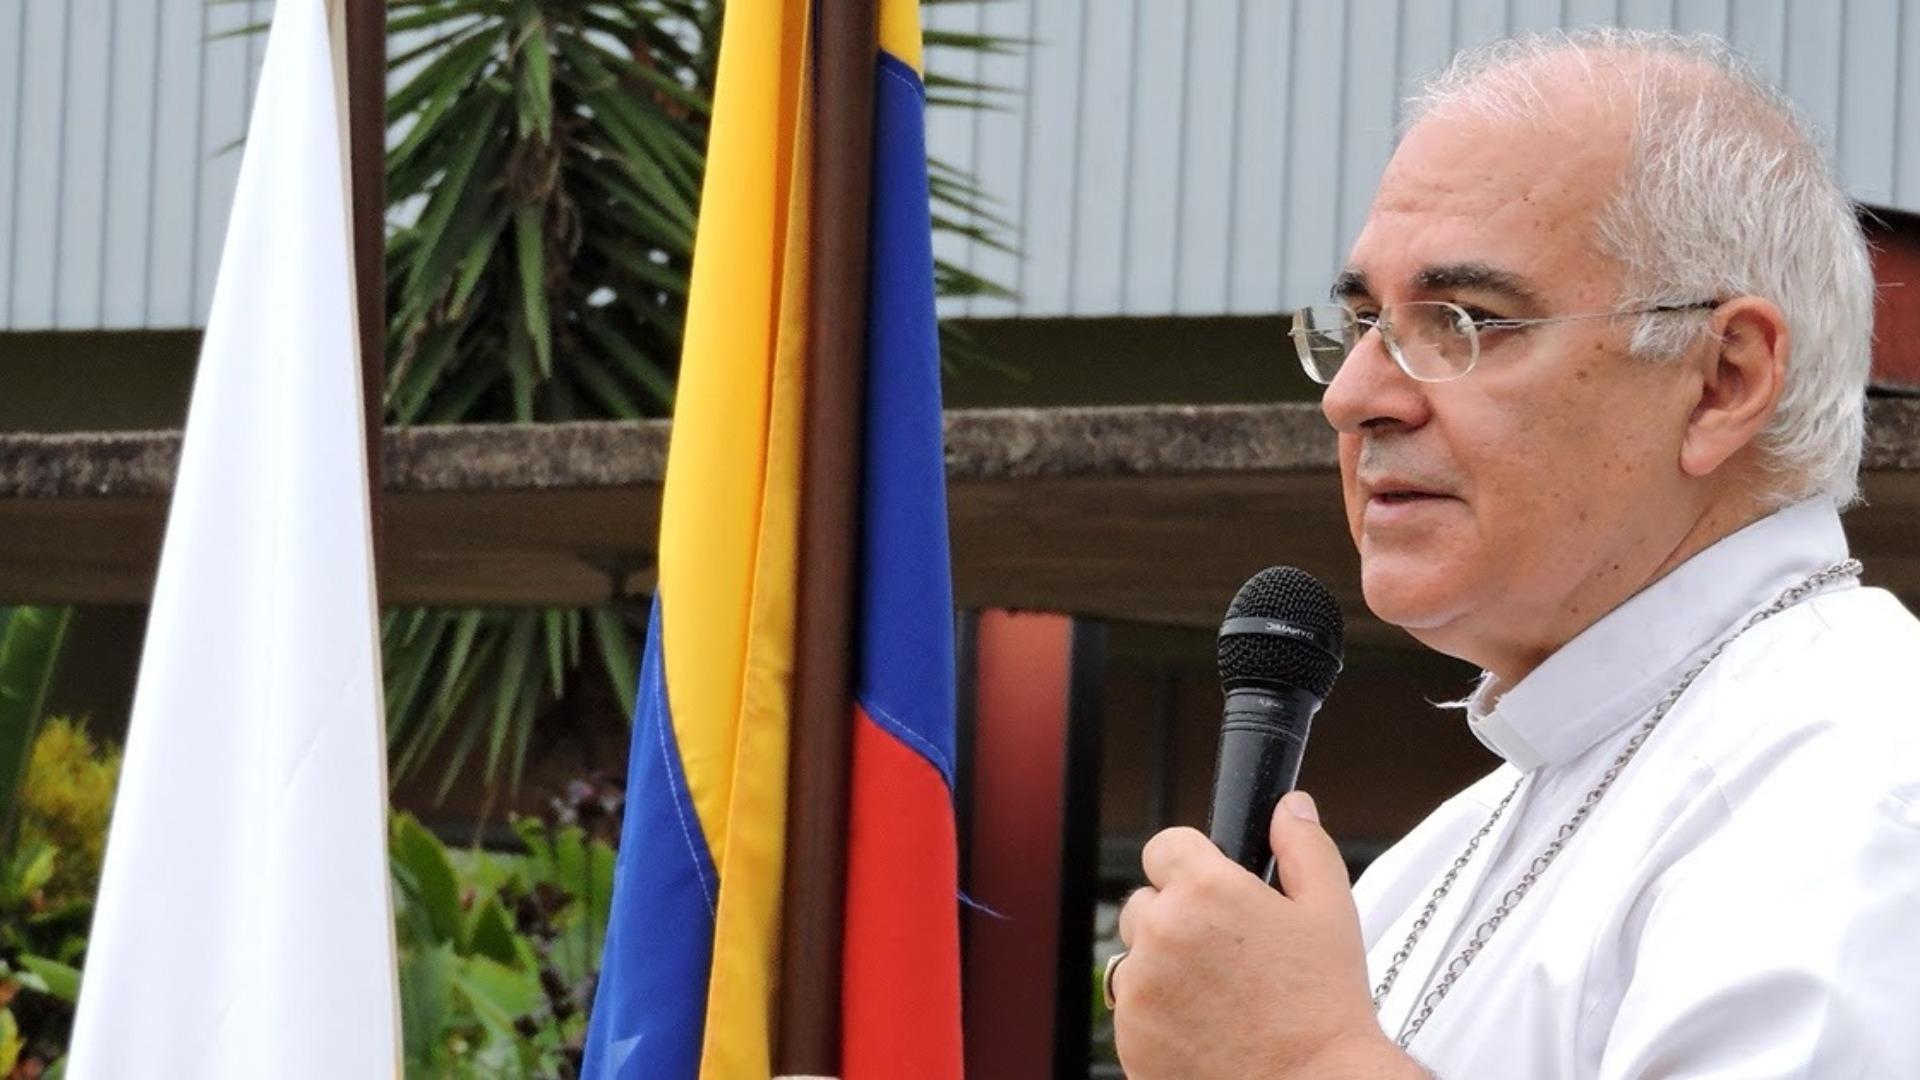 Runrunes de Bocaranda: MEDIO - LA IGLESIA UNIDA